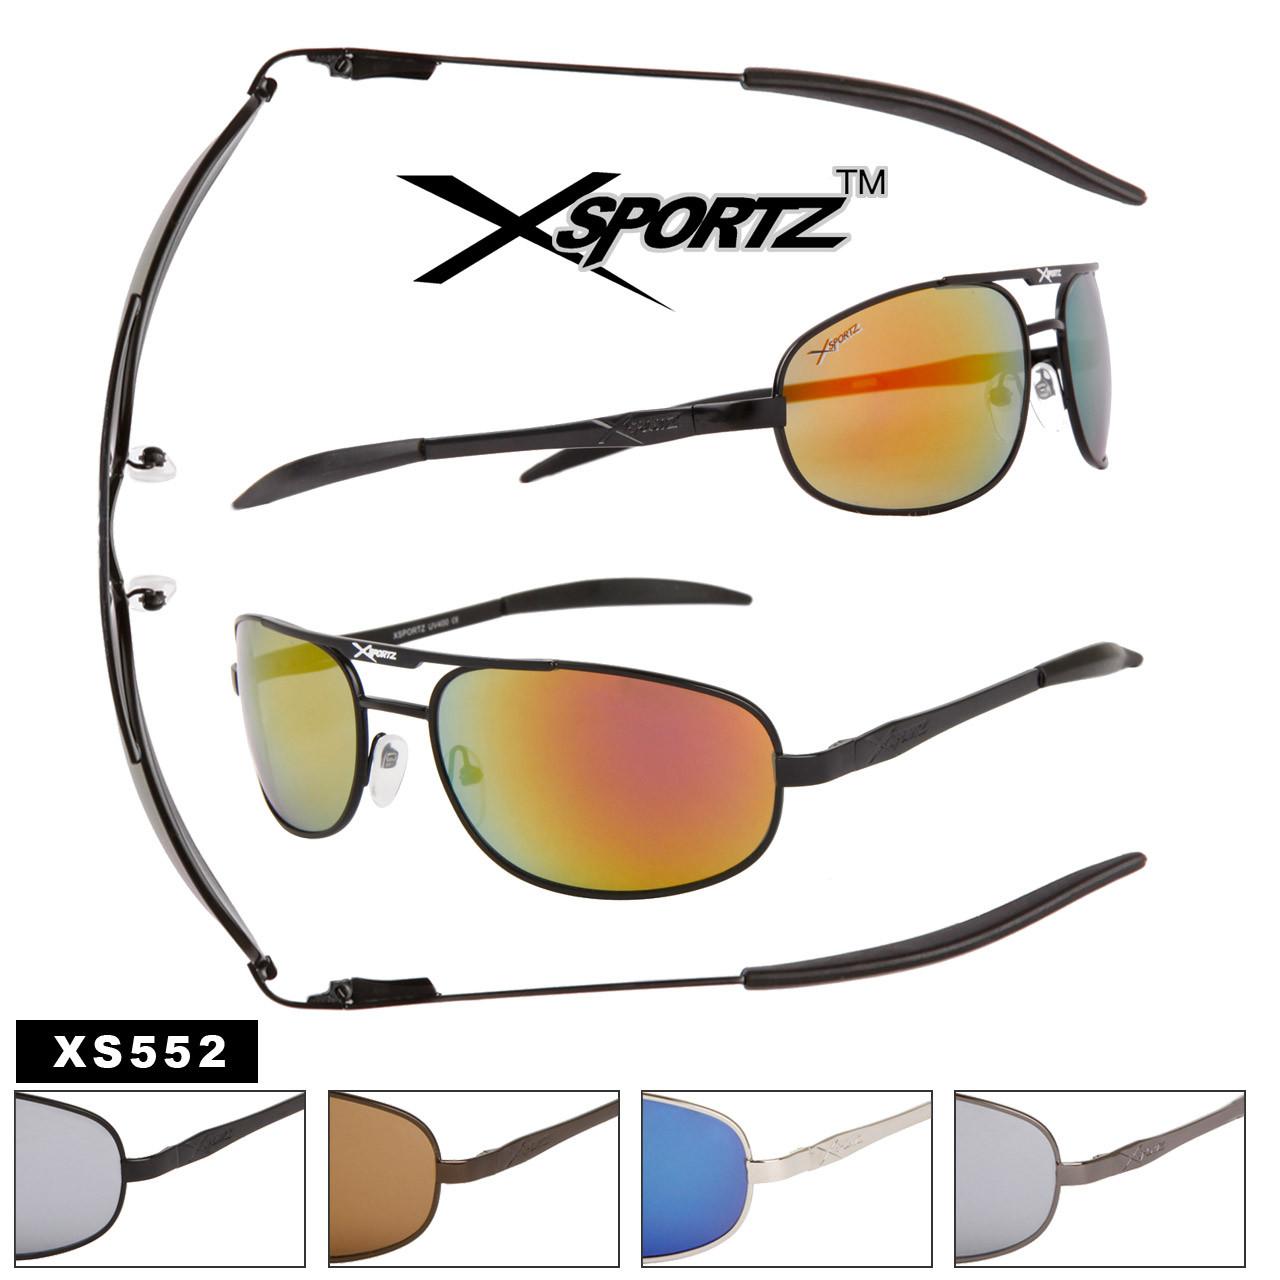 Xsportz™ Sunglasses - Style # XS552